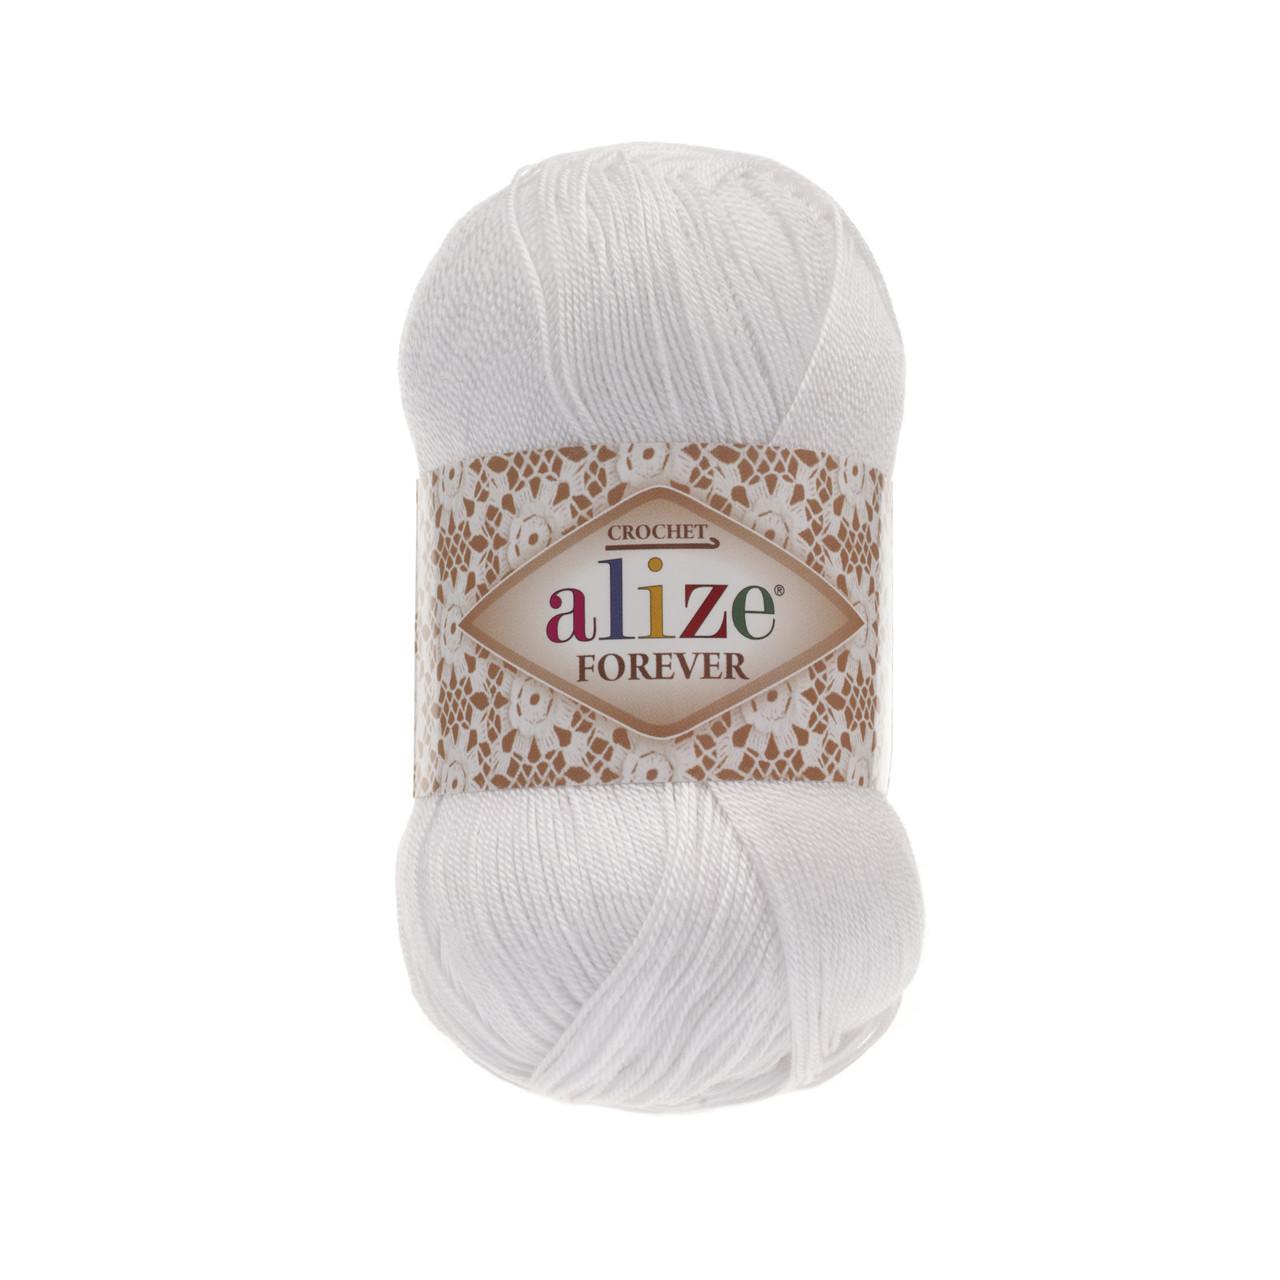 Пряжа Ализе Форевер Alize Forever, цвет №55 белый